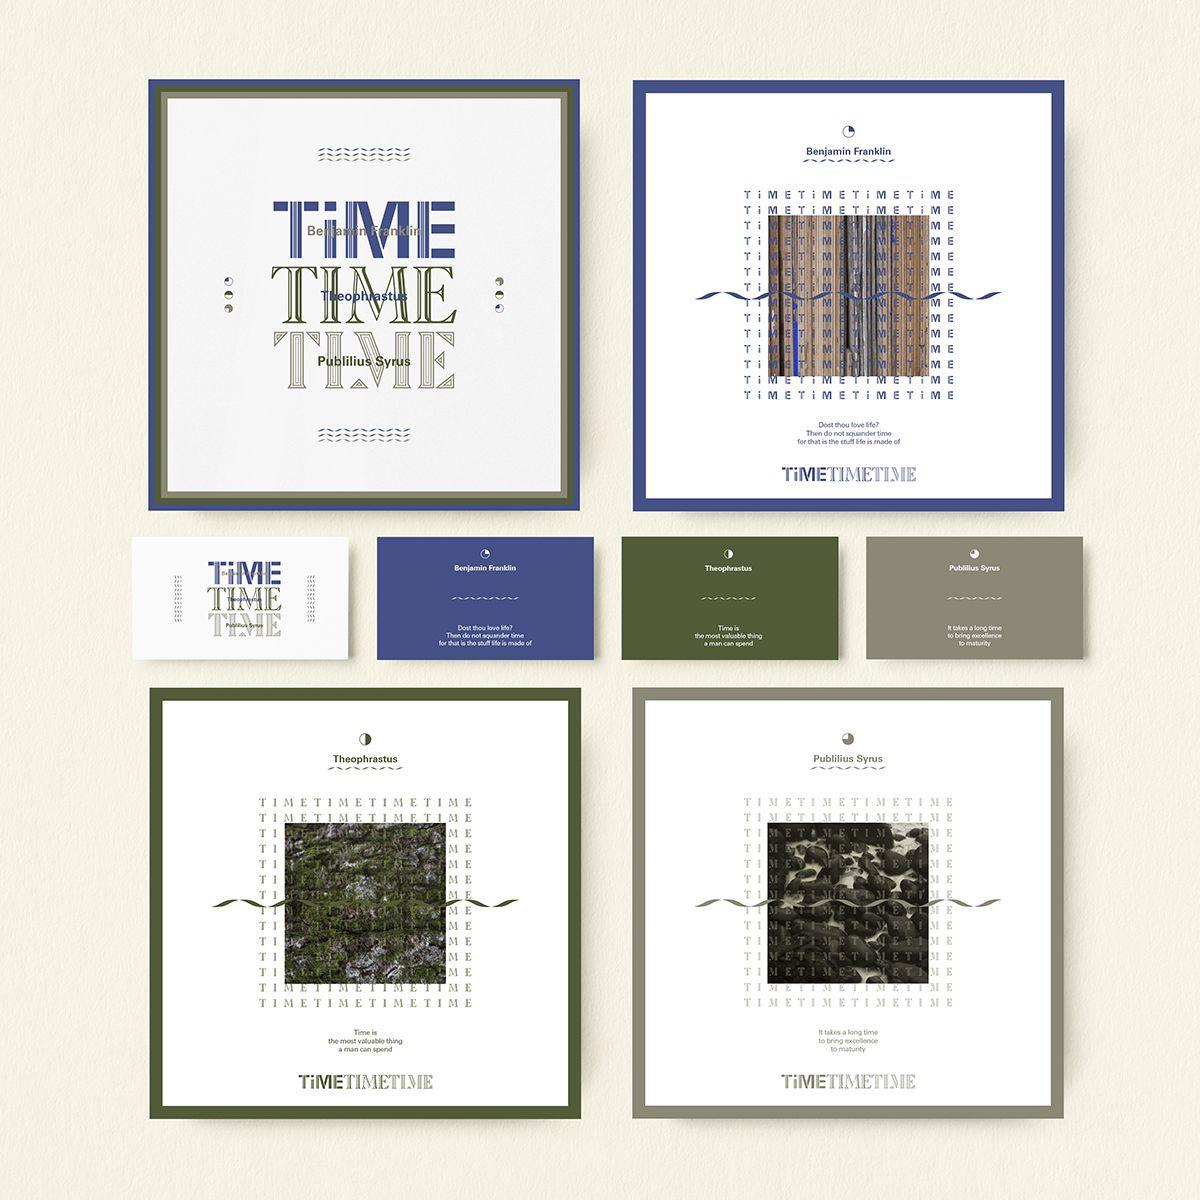 TIME series_ Benjamin Franklin, Theophrastus, Publilius Syrus